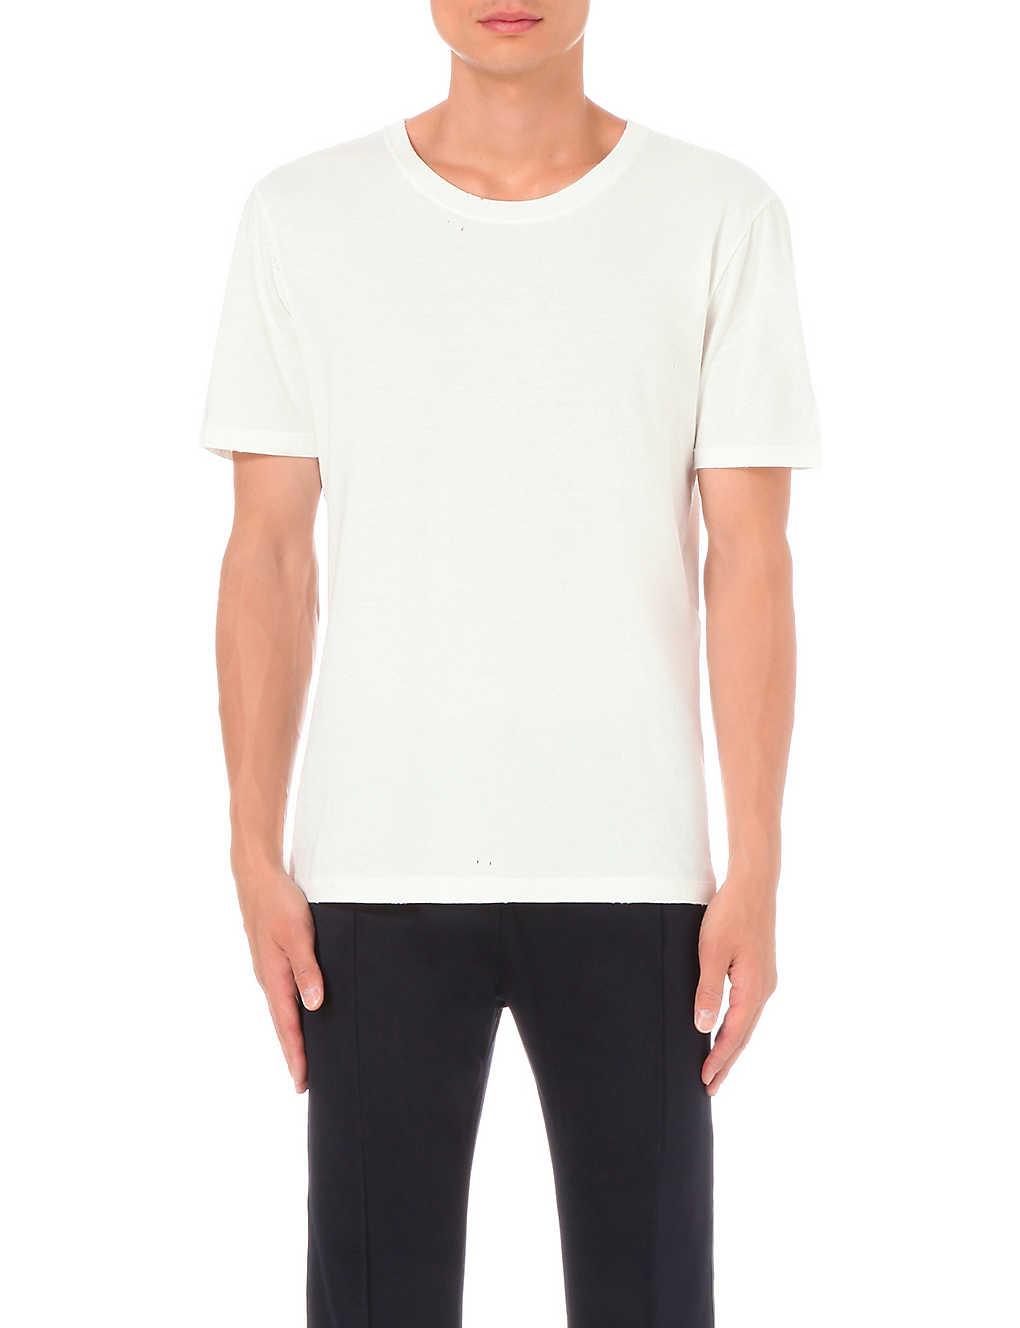 70d31091e GUCCI - Distressed cotton-jersey t-shirt | Selfridges.com